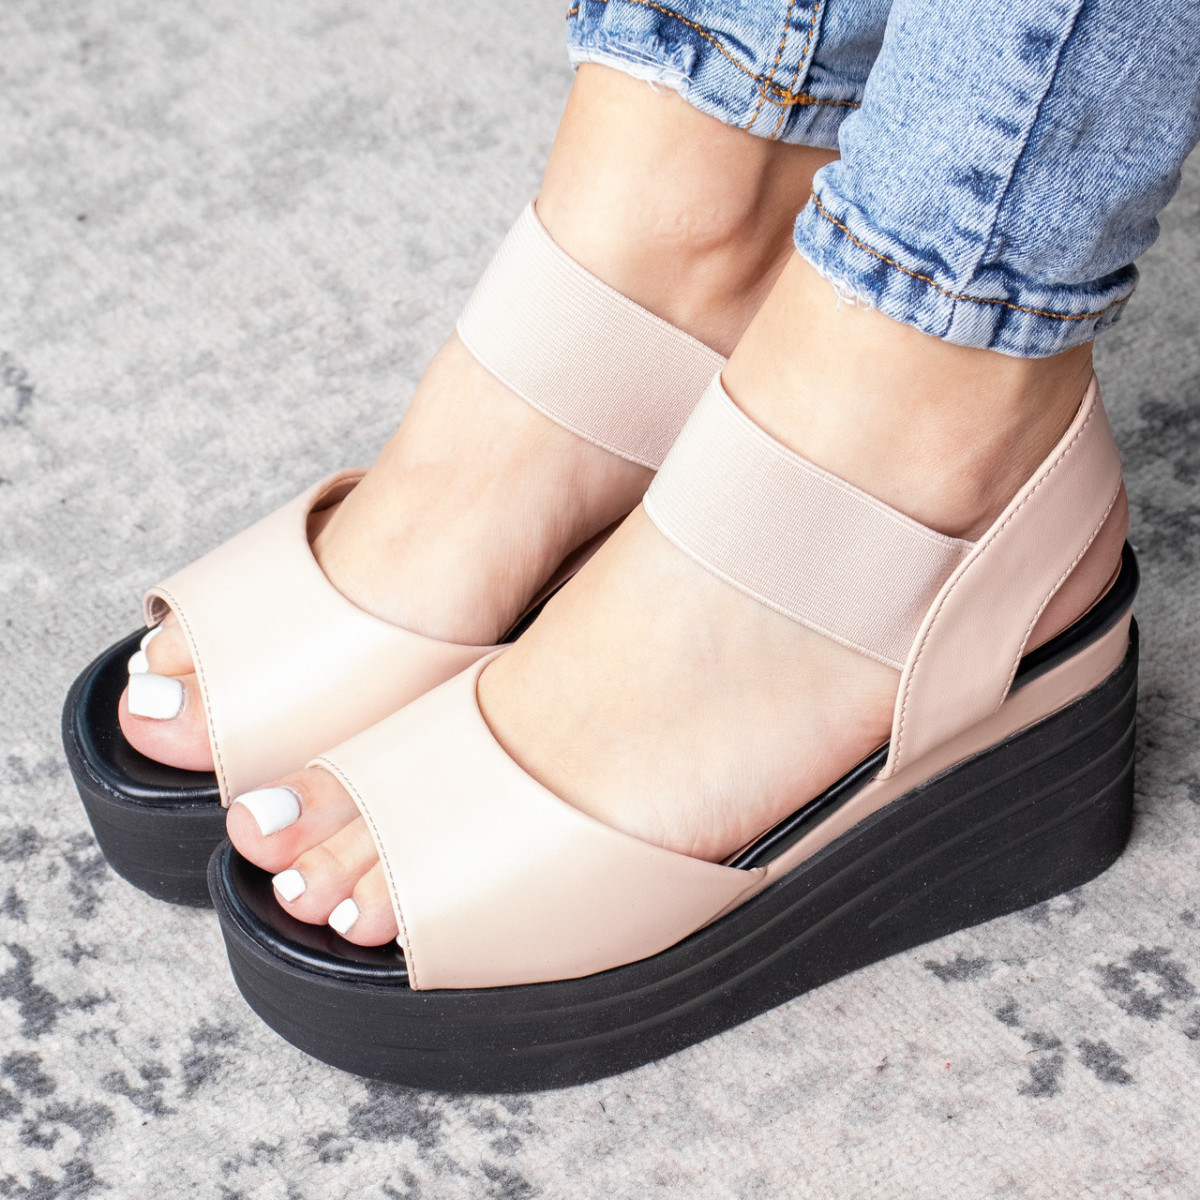 Женские сандалии Fashion Batista 3082 36 размер 23 см Бежевый